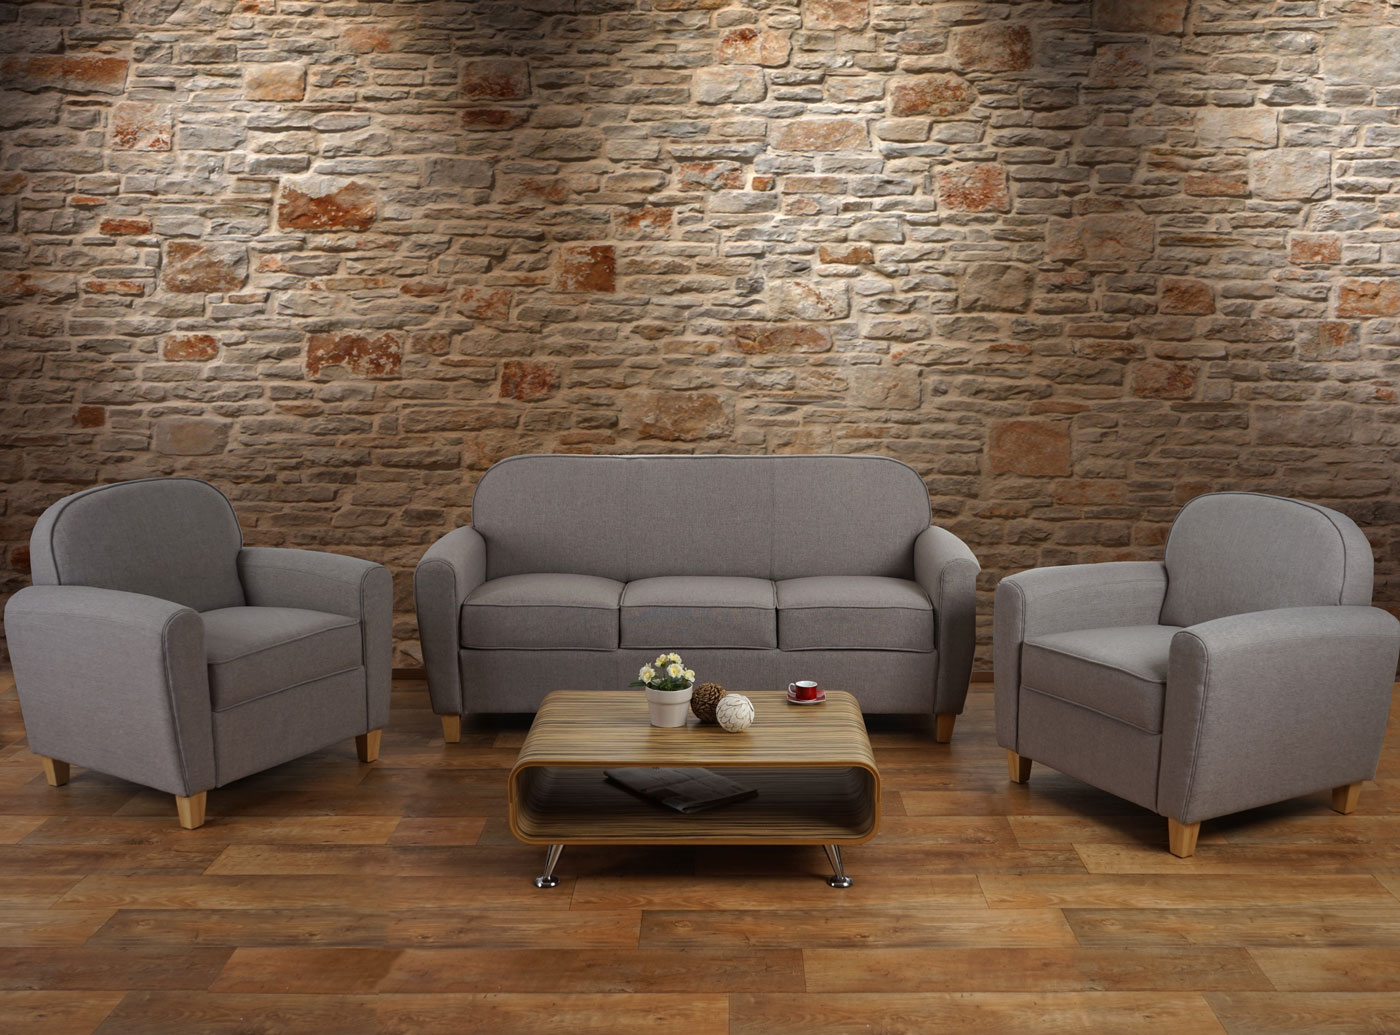 3 1 1 sofagarnitur malm t377 couch loungesofa retro 50er jahre design grau textil. Black Bedroom Furniture Sets. Home Design Ideas